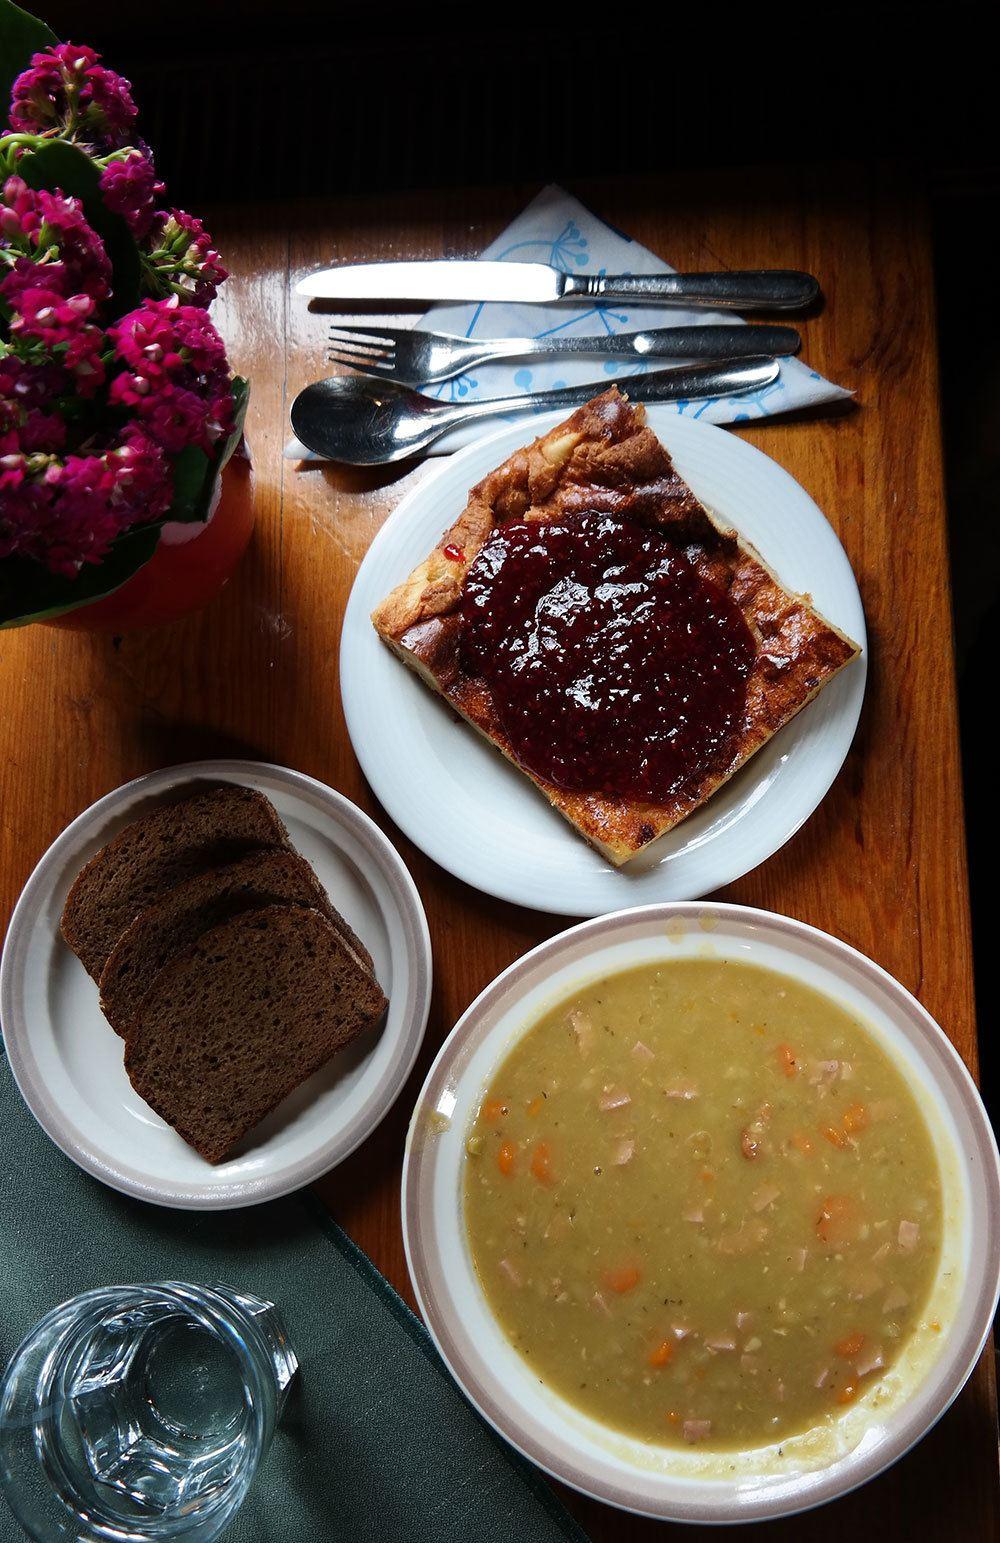 Pea soup and pancakes in Turku, Finland. Travel photo by Katja Presnal | @skimbaco